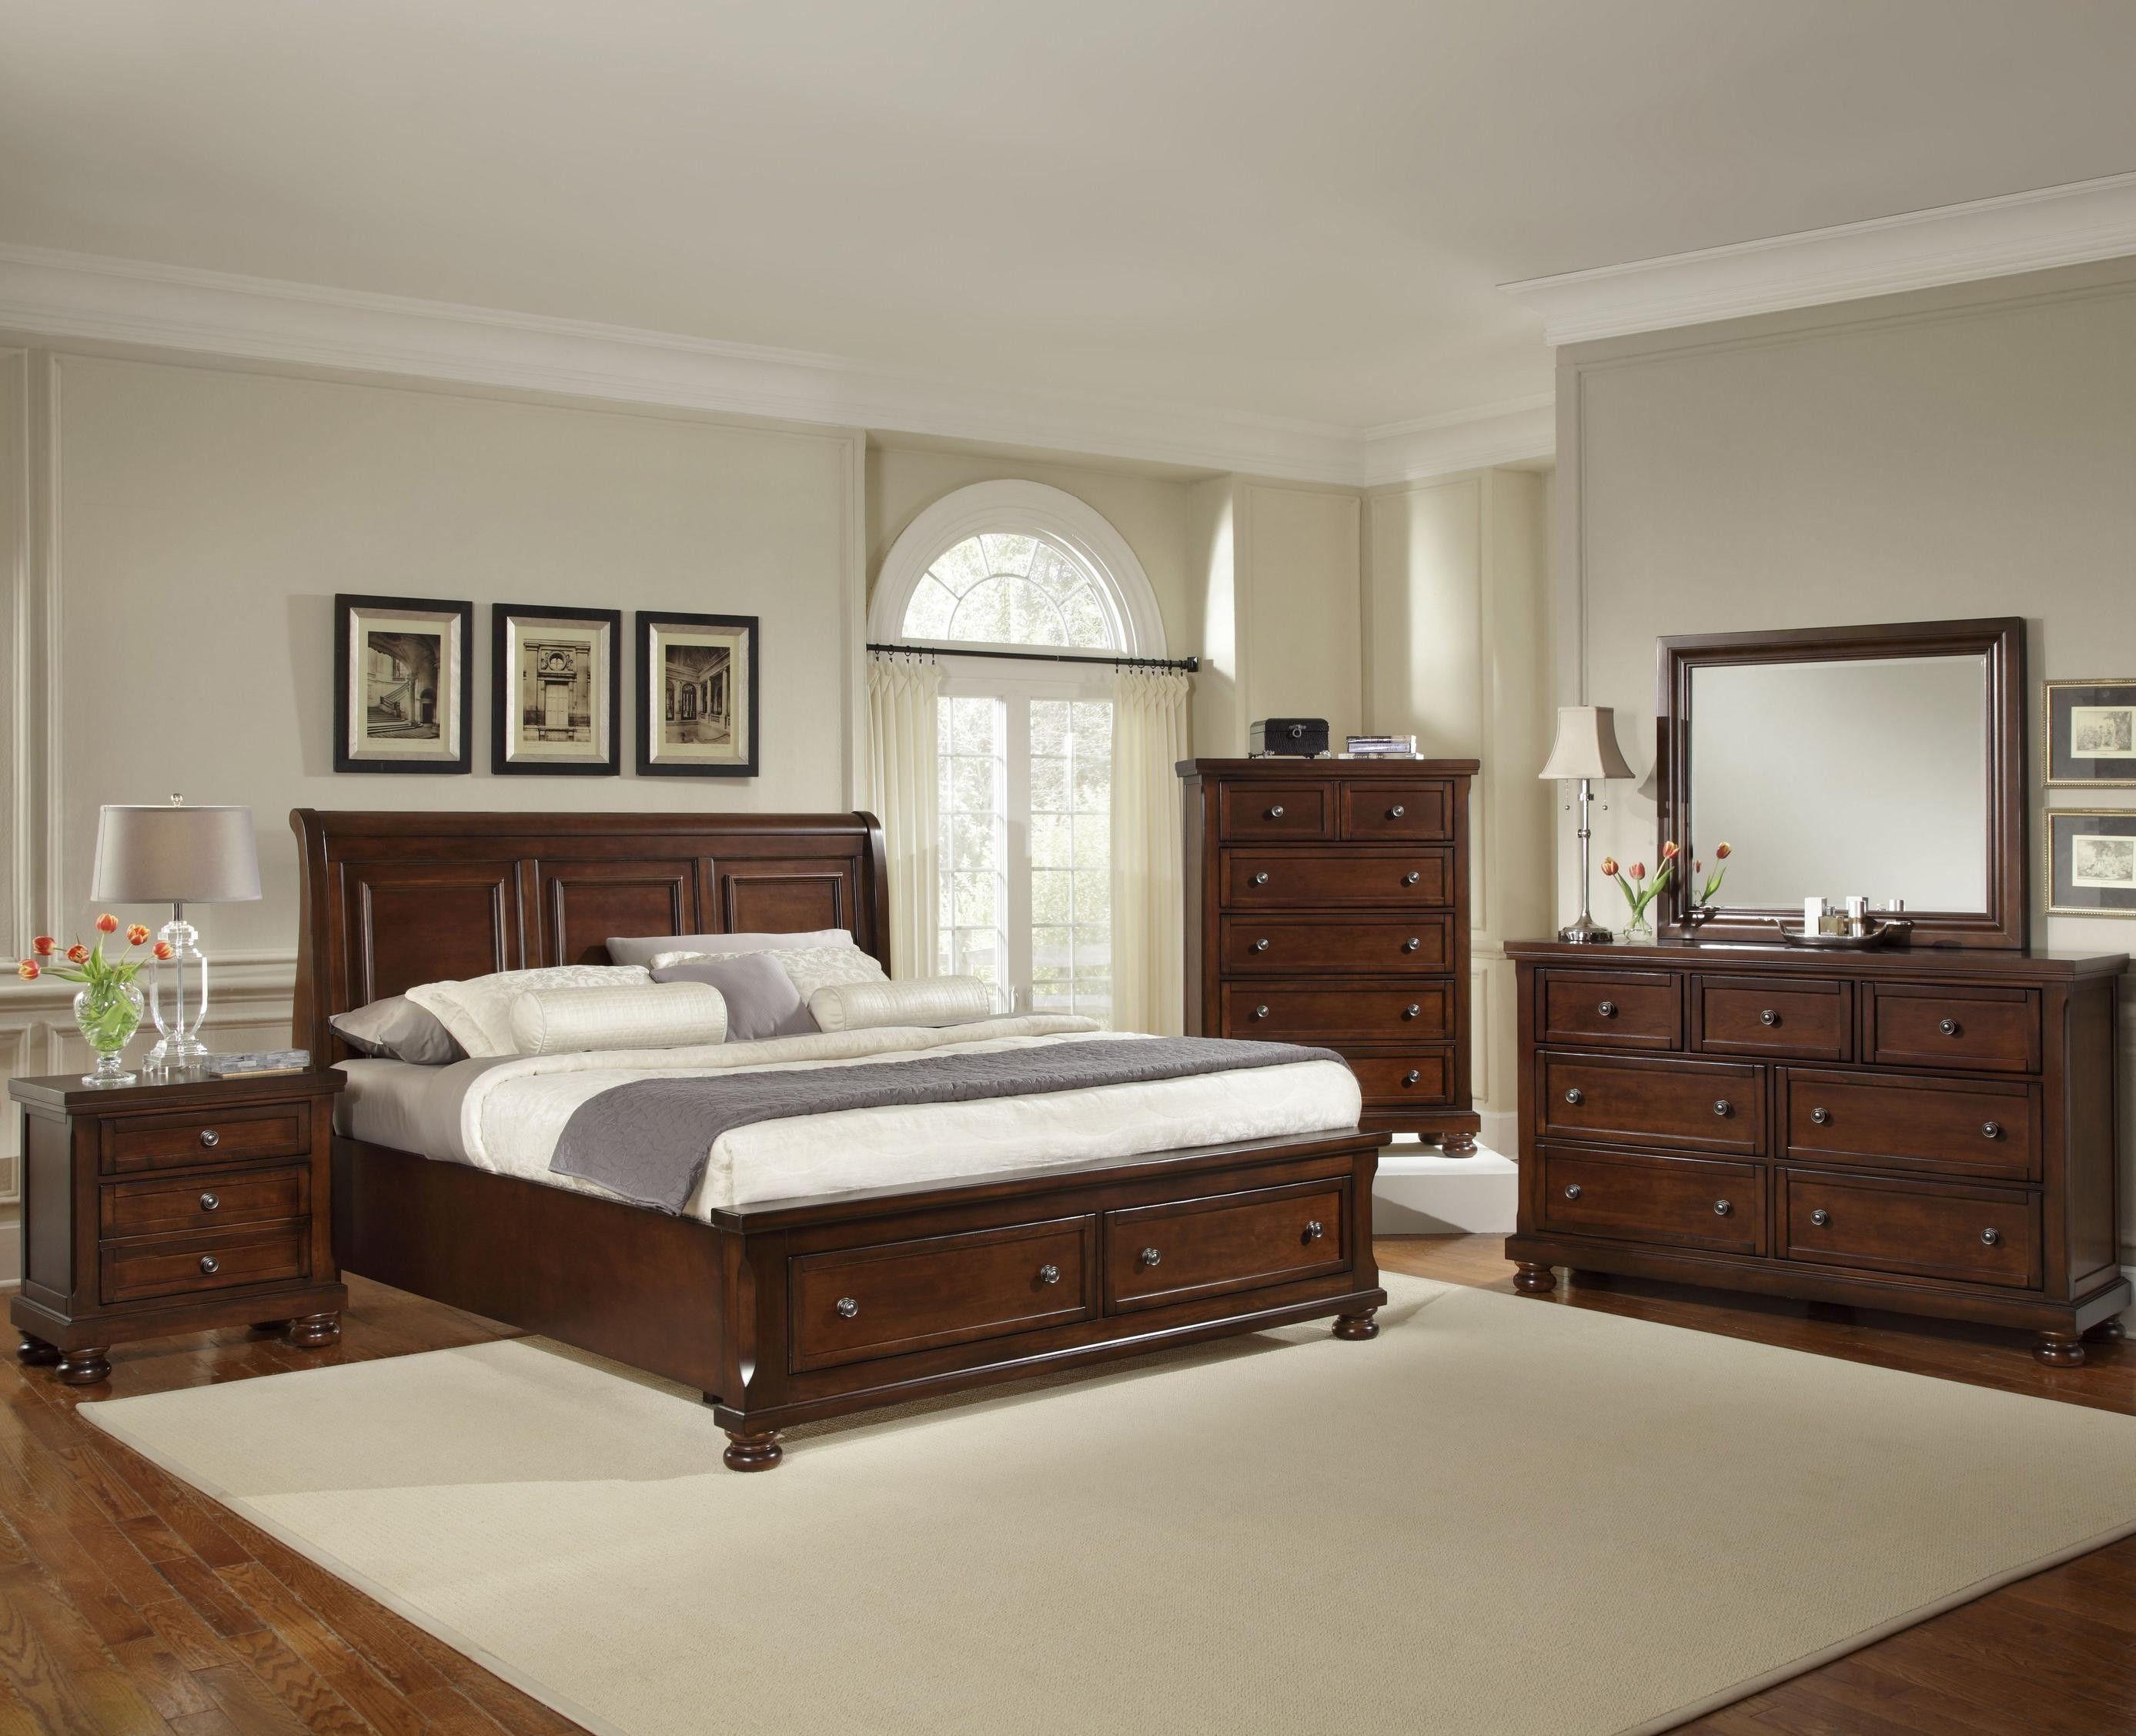 Italian bedrooms: Comfort, elegance and amazing lenzuola ...